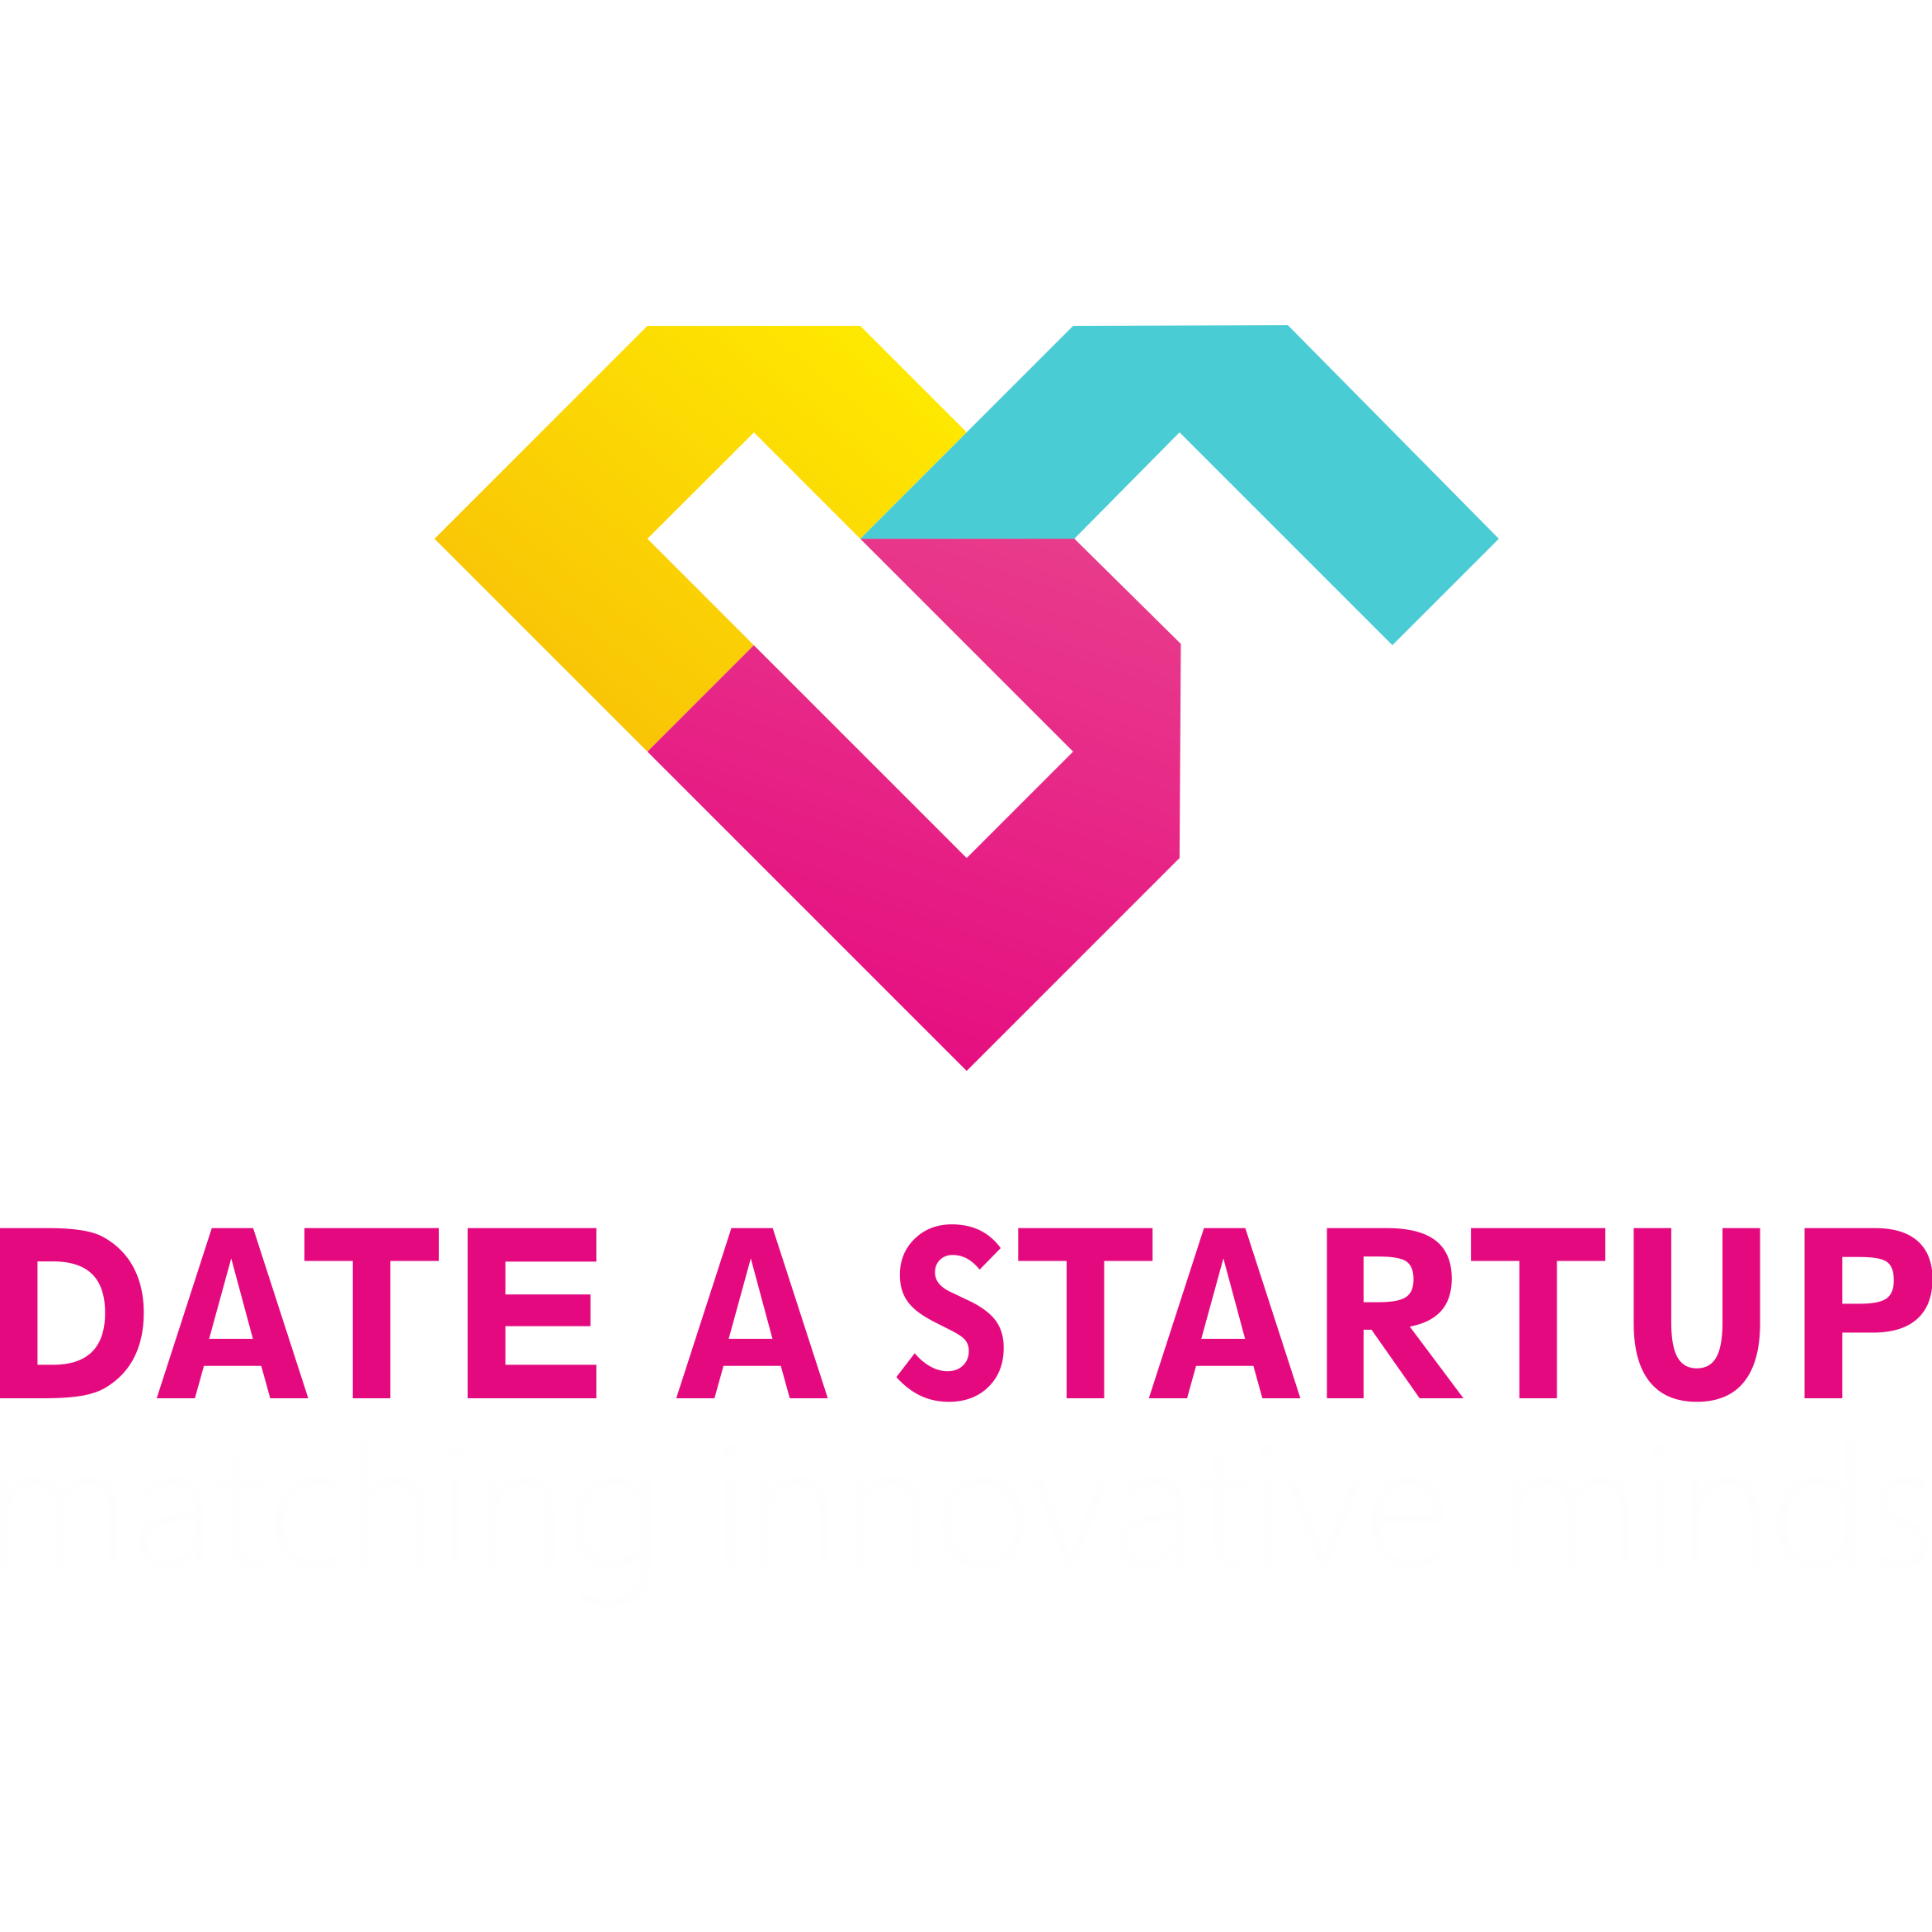 Date a startup